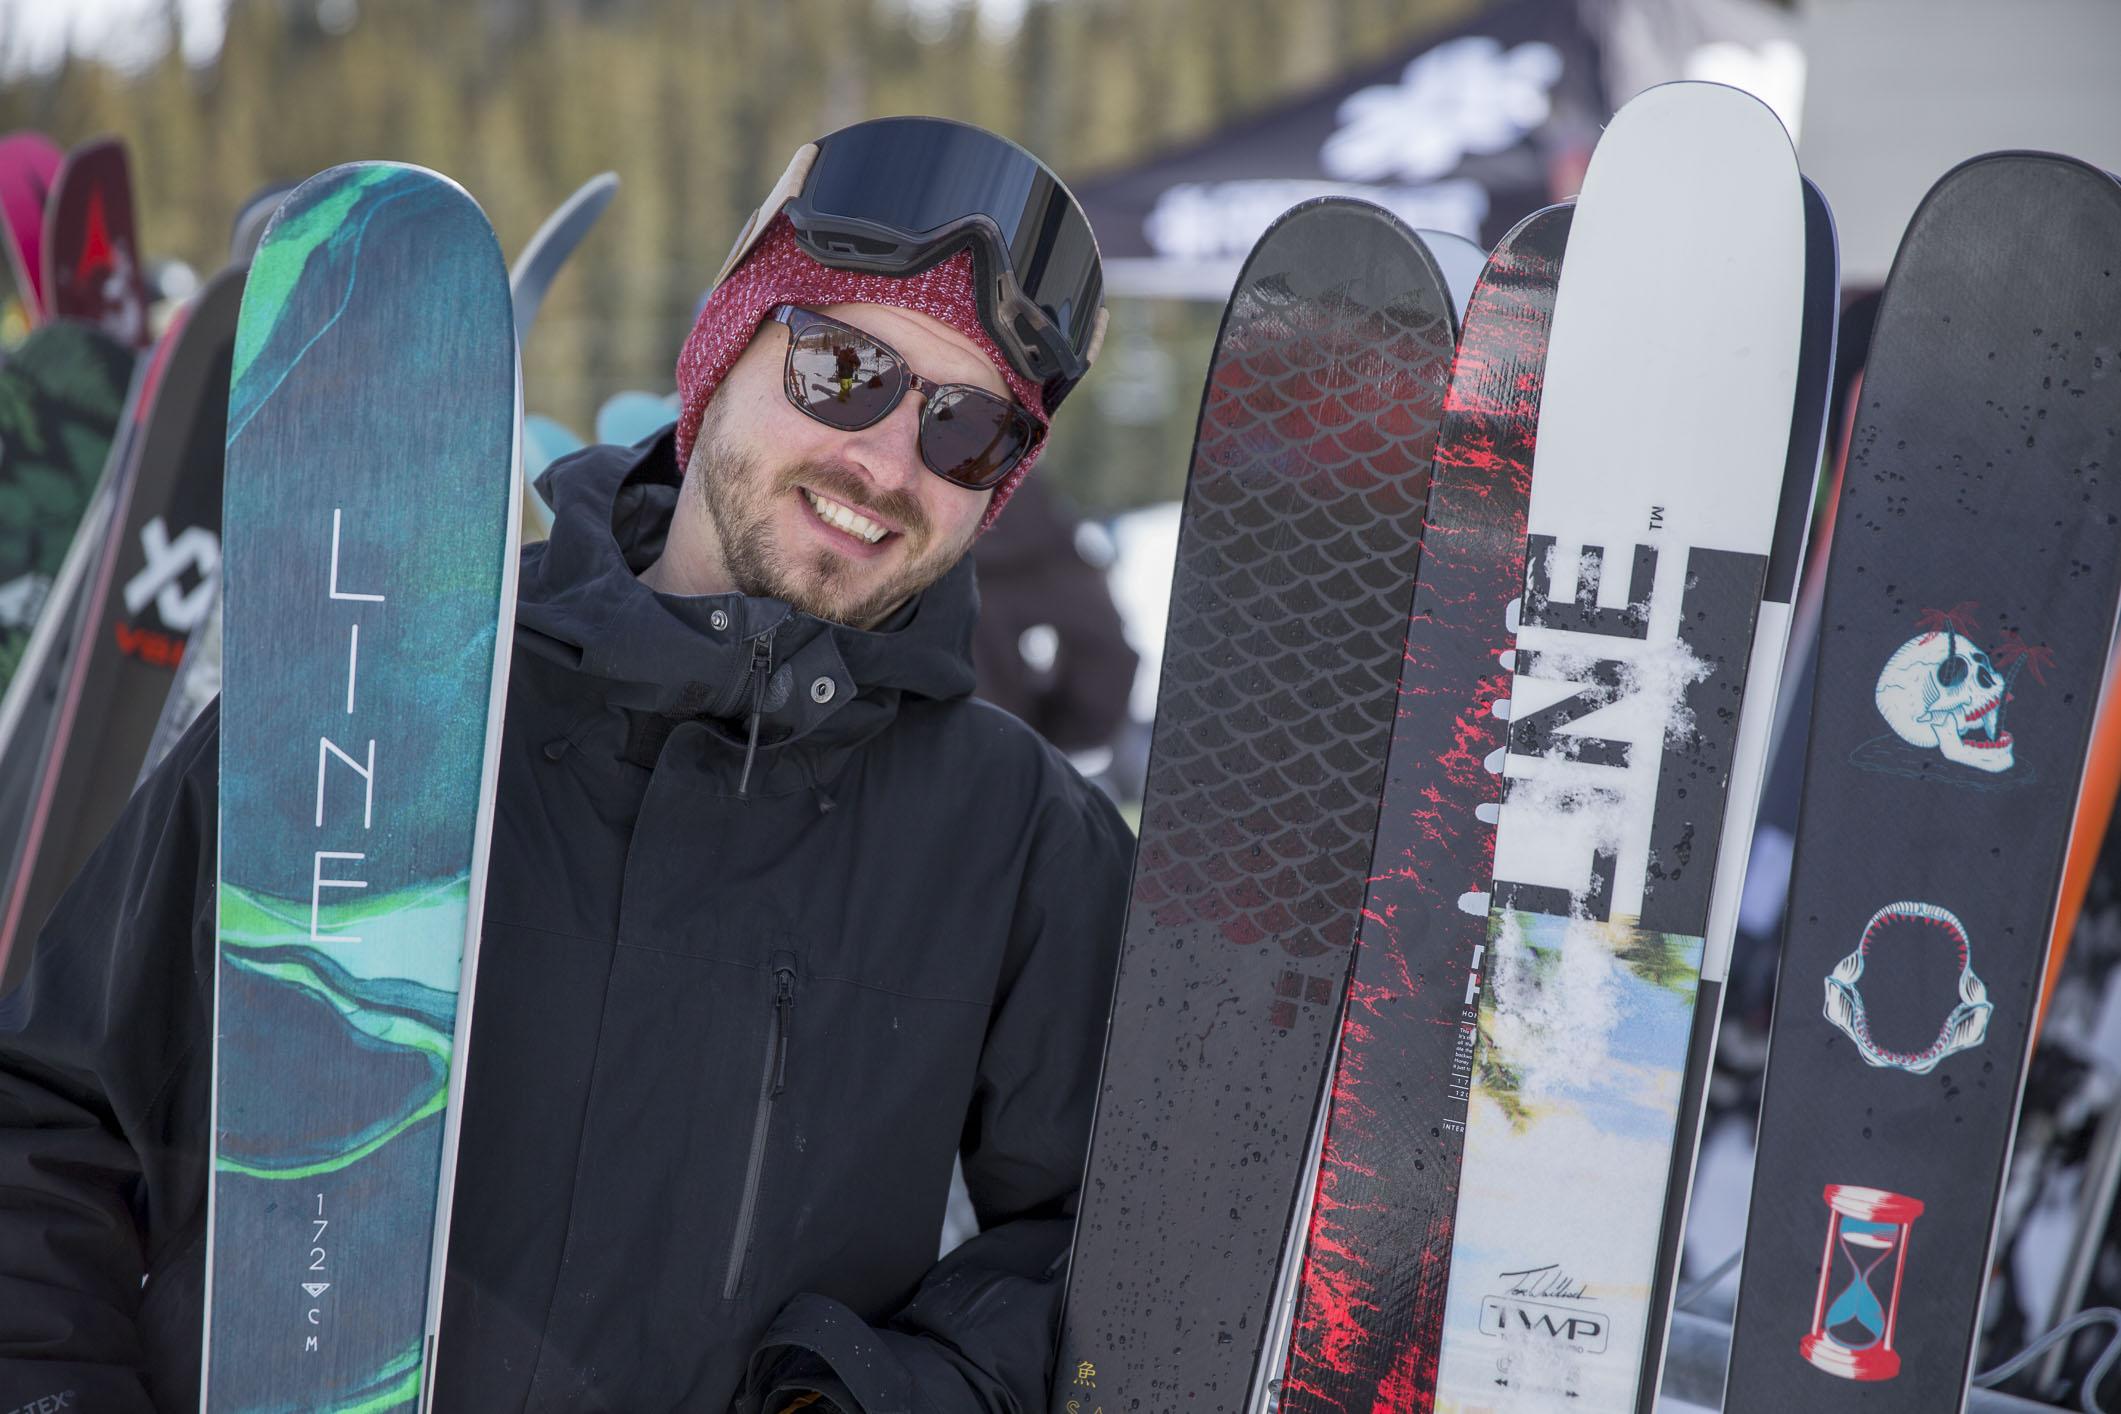 Line skis we re testing this week include the Chronic  Pandora 94  Sick Day  104  Sakana  Pandora 104  Sick Day 114  Tom Wallisch Pro  Honey Badger. 4160ec9a513d